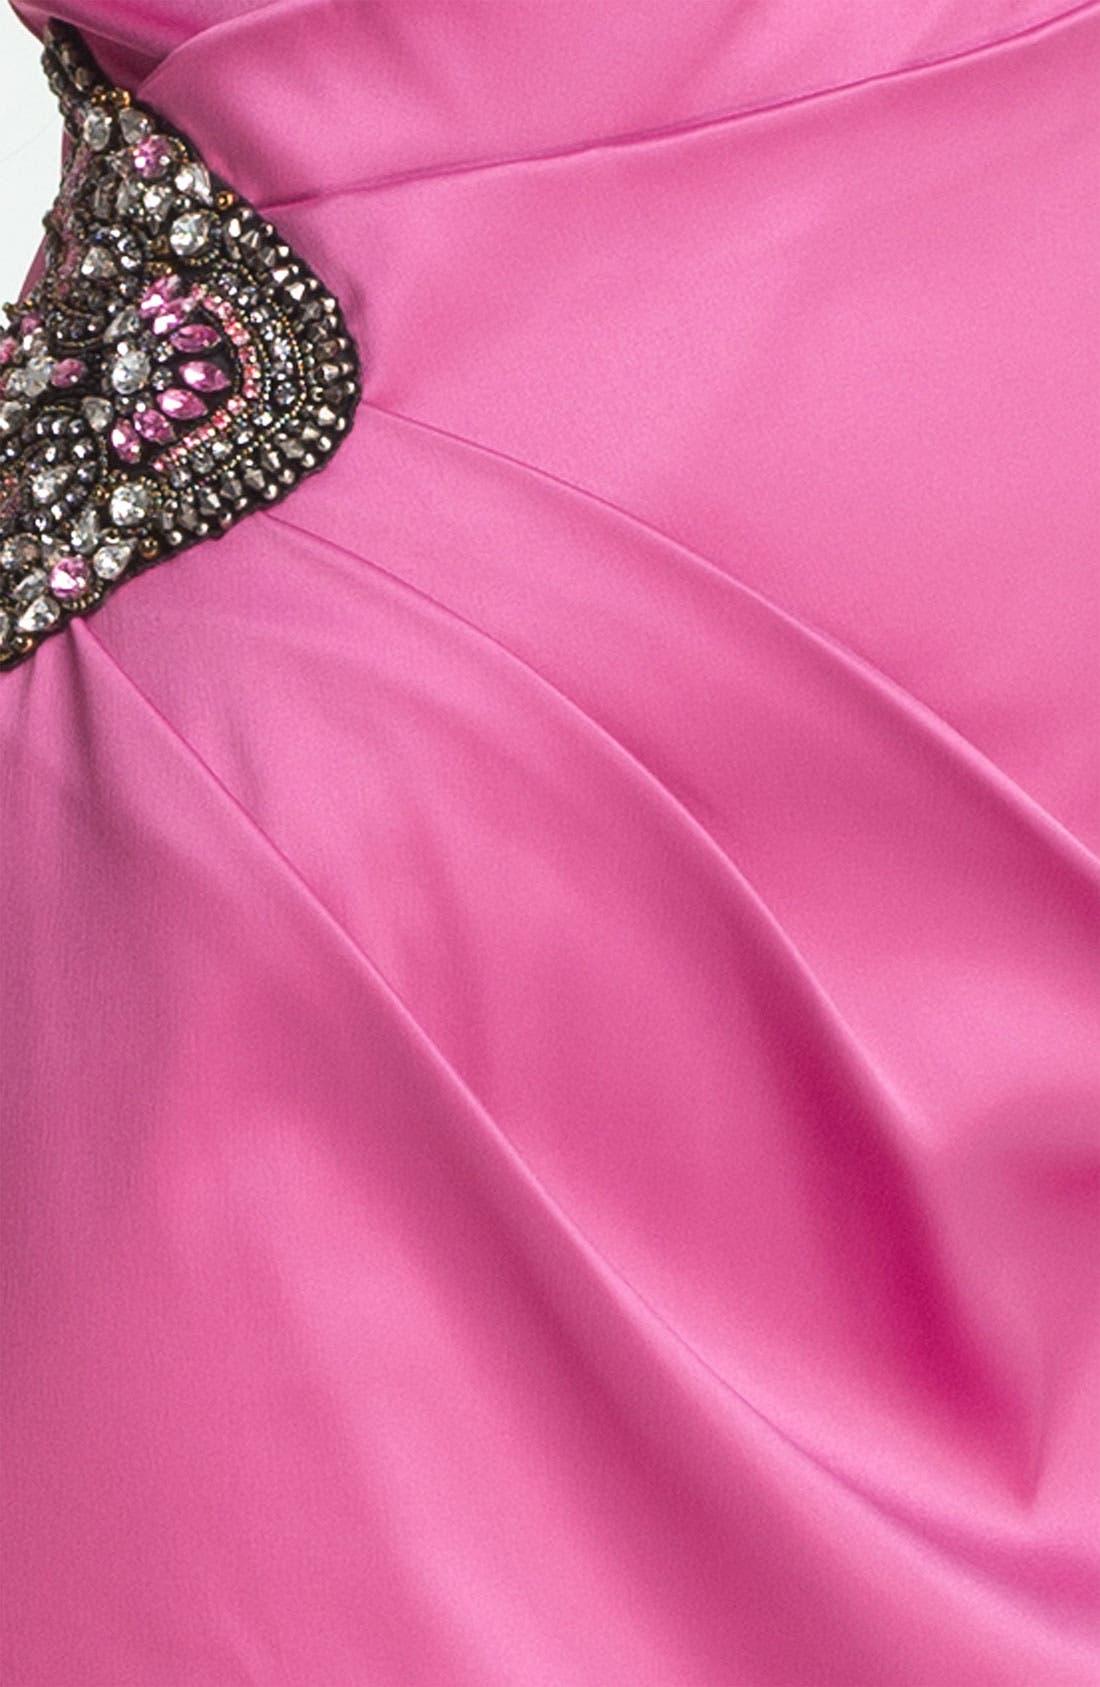 Beaded One-Shoulder Satin Dress,                             Alternate thumbnail 19, color,